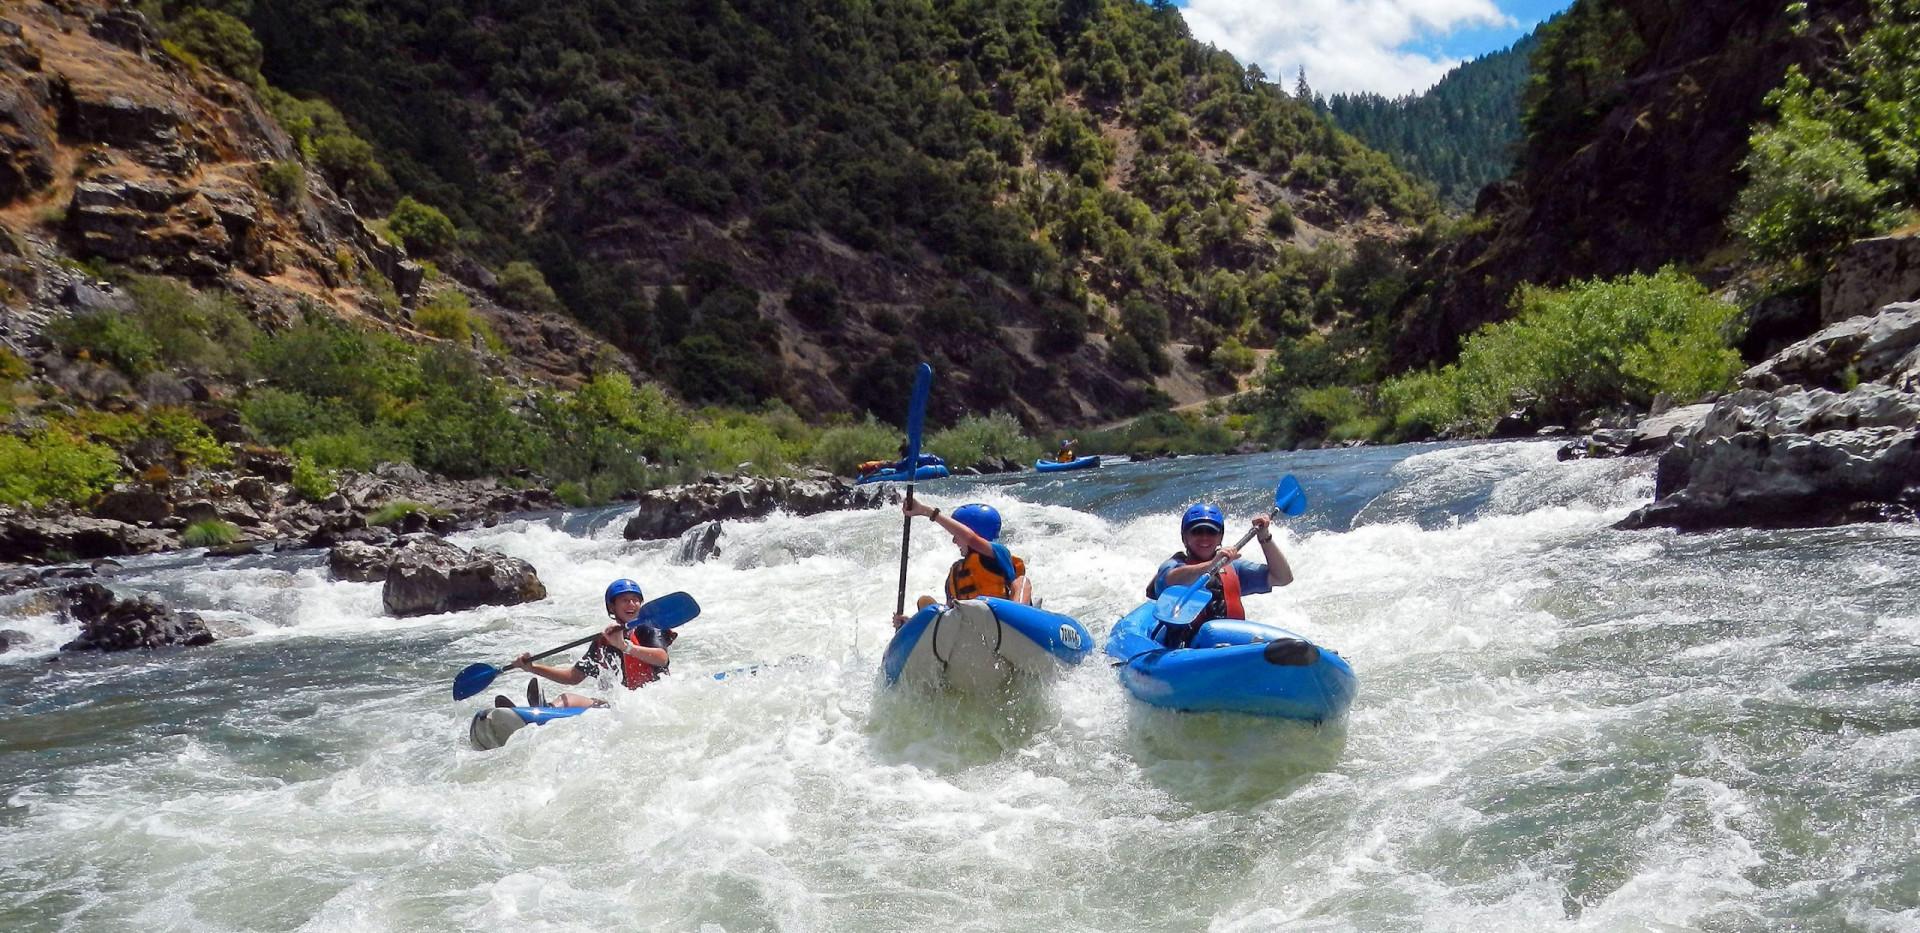 Rogue River Rafting - Oregon Rafting - Family - Multi-generational